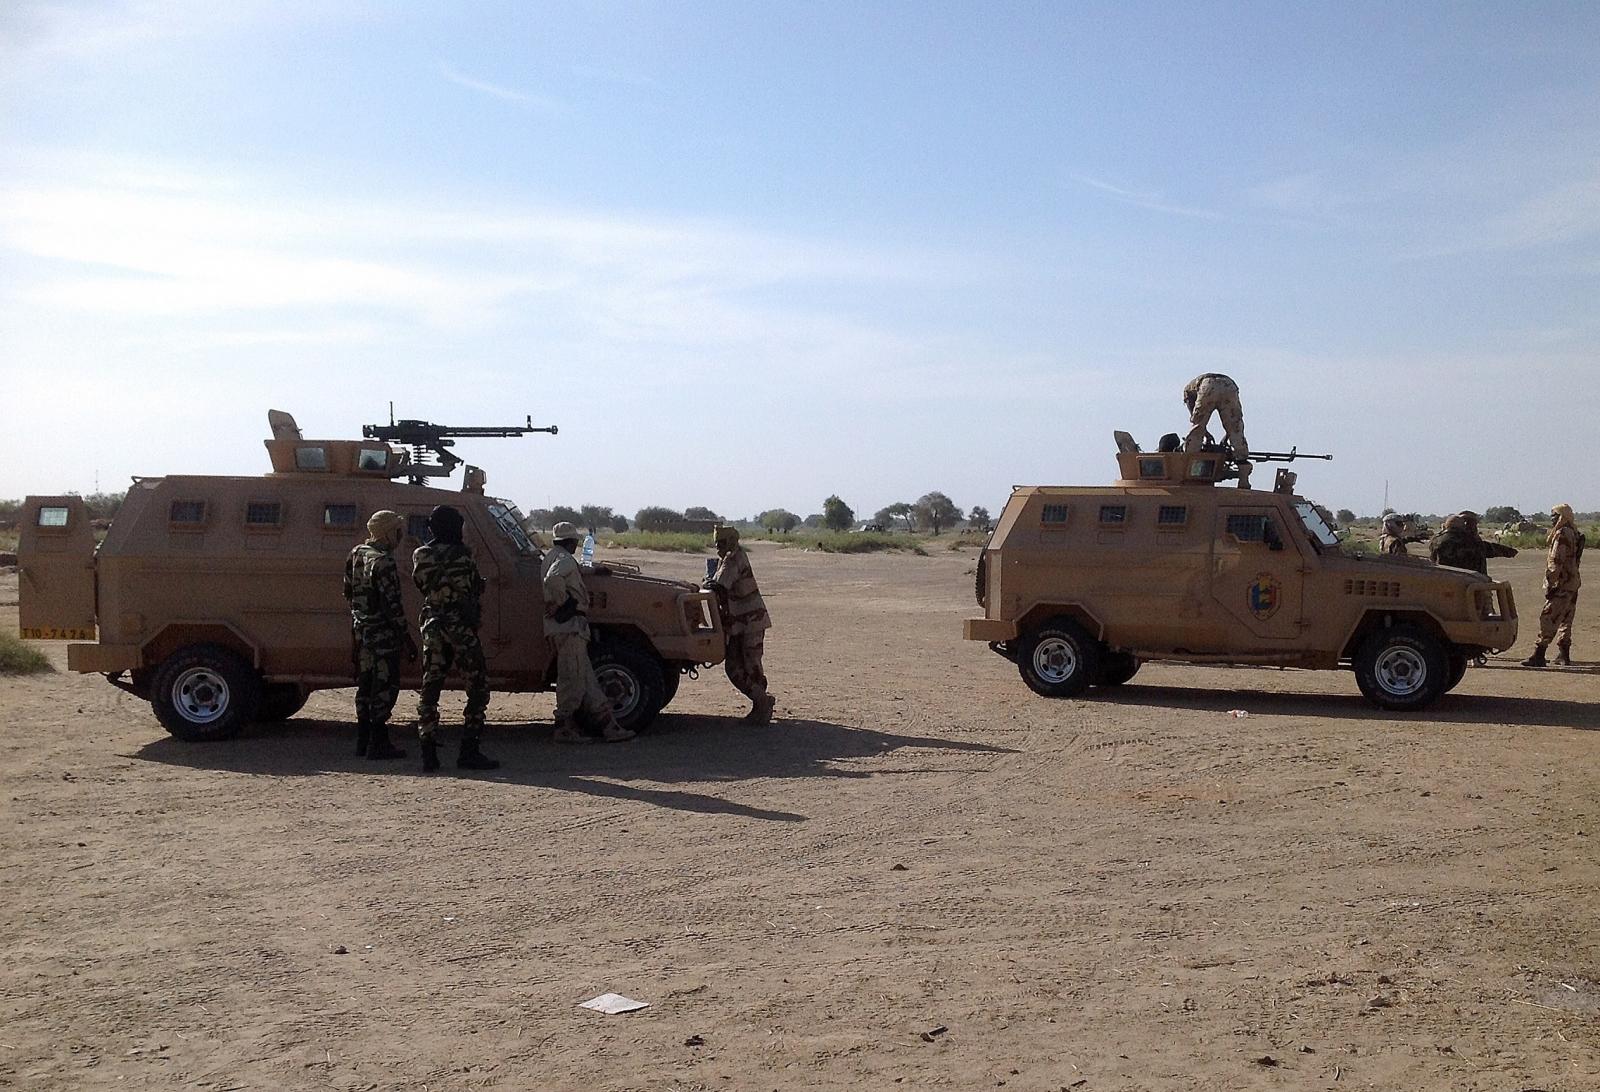 Boko Haram insurgency against African nations